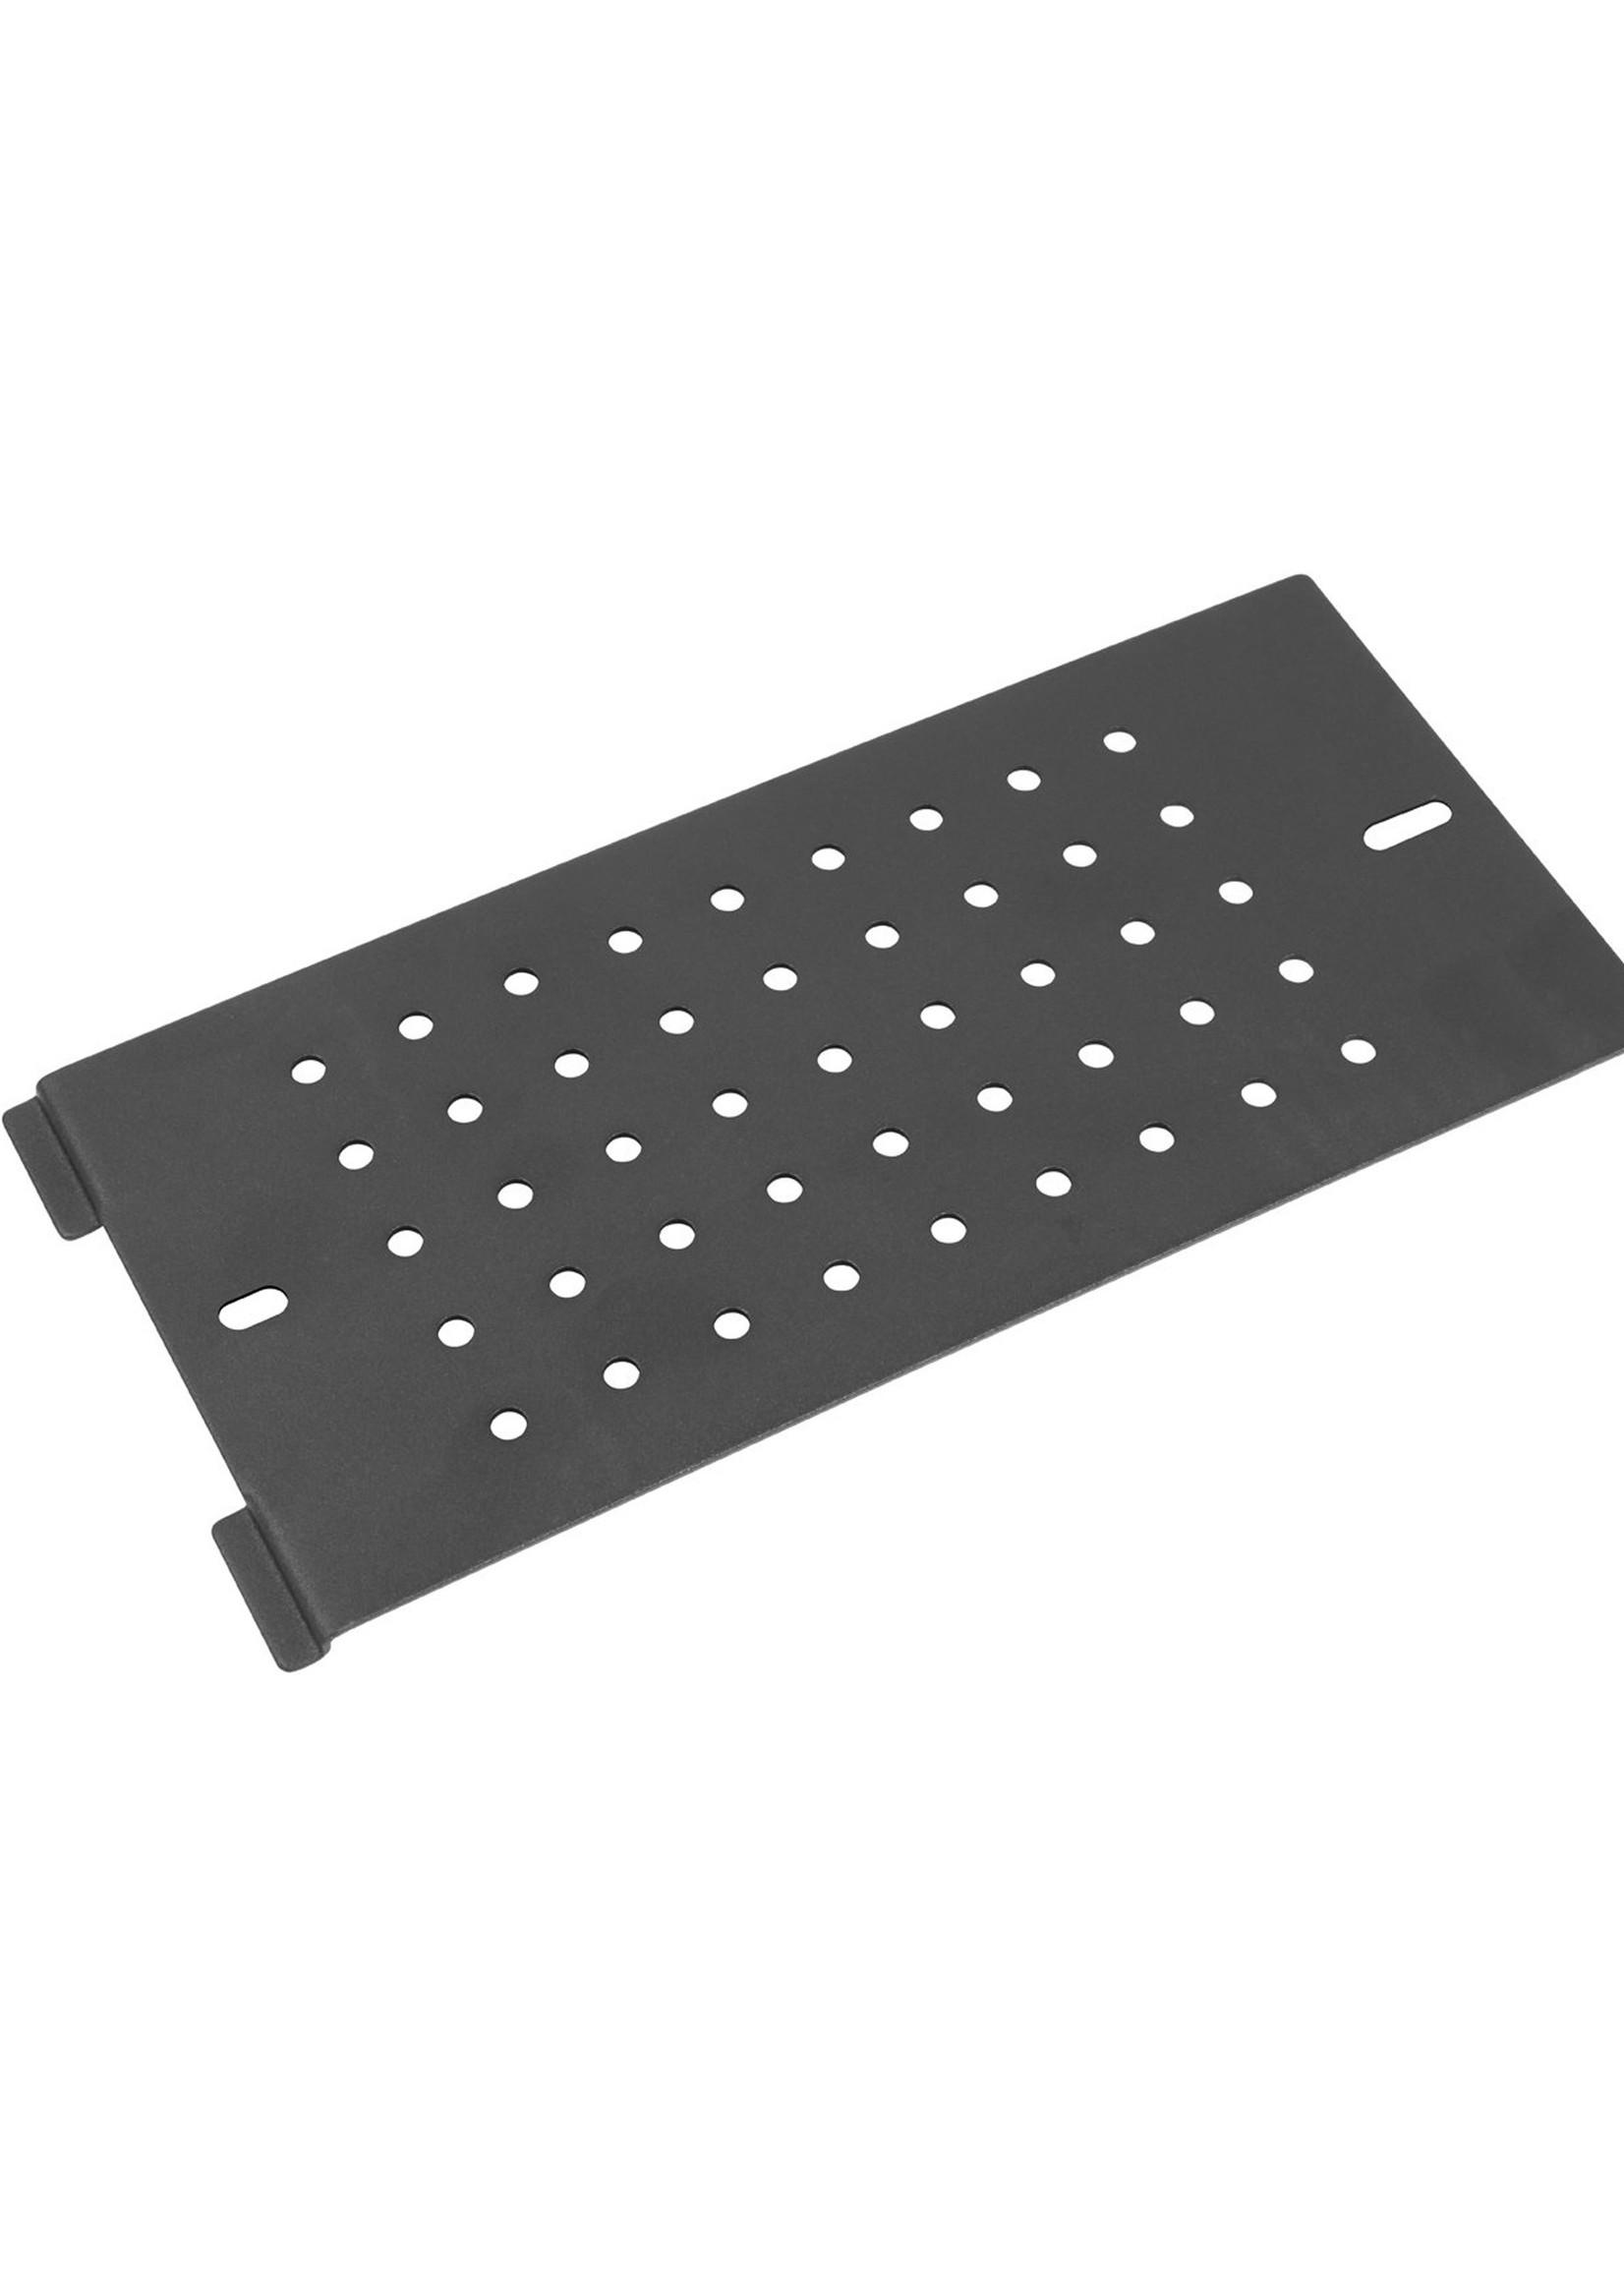 Rockboard Rockboard The Tray- Universal Power Supply Mounting Solution